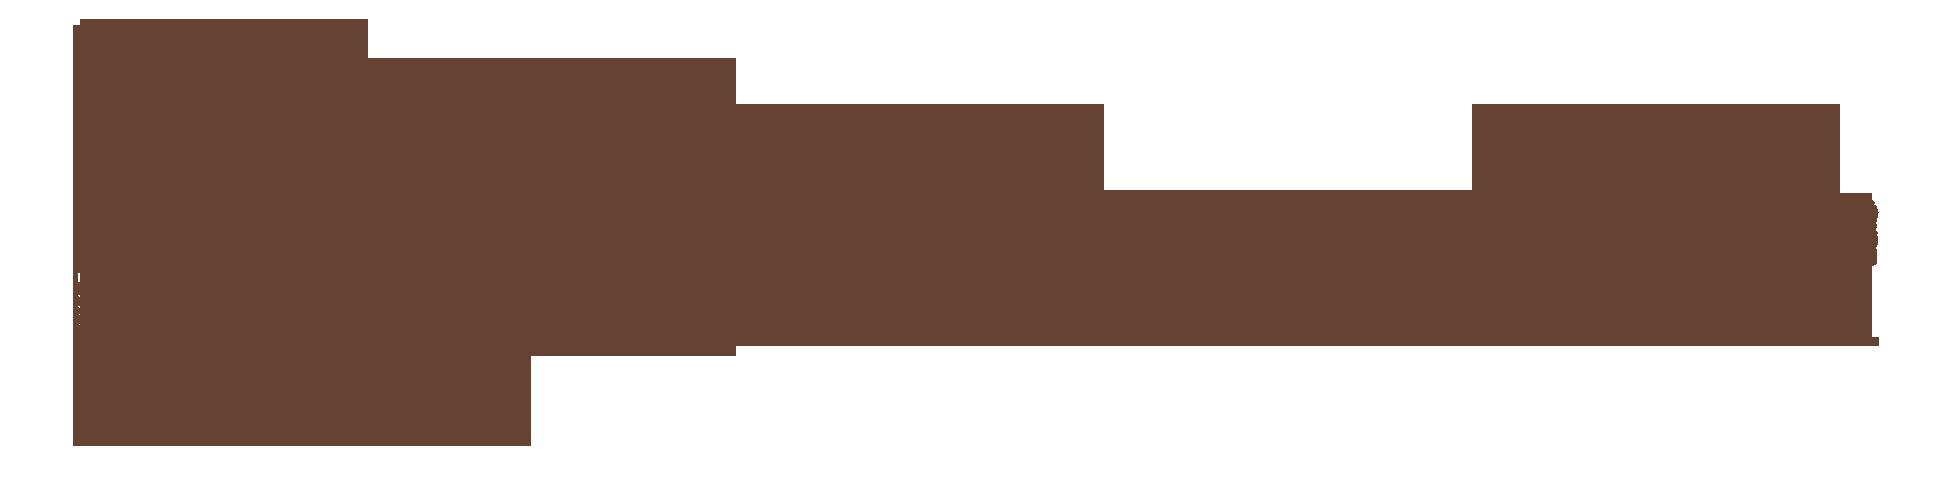 Northern_Tilth_no address.png